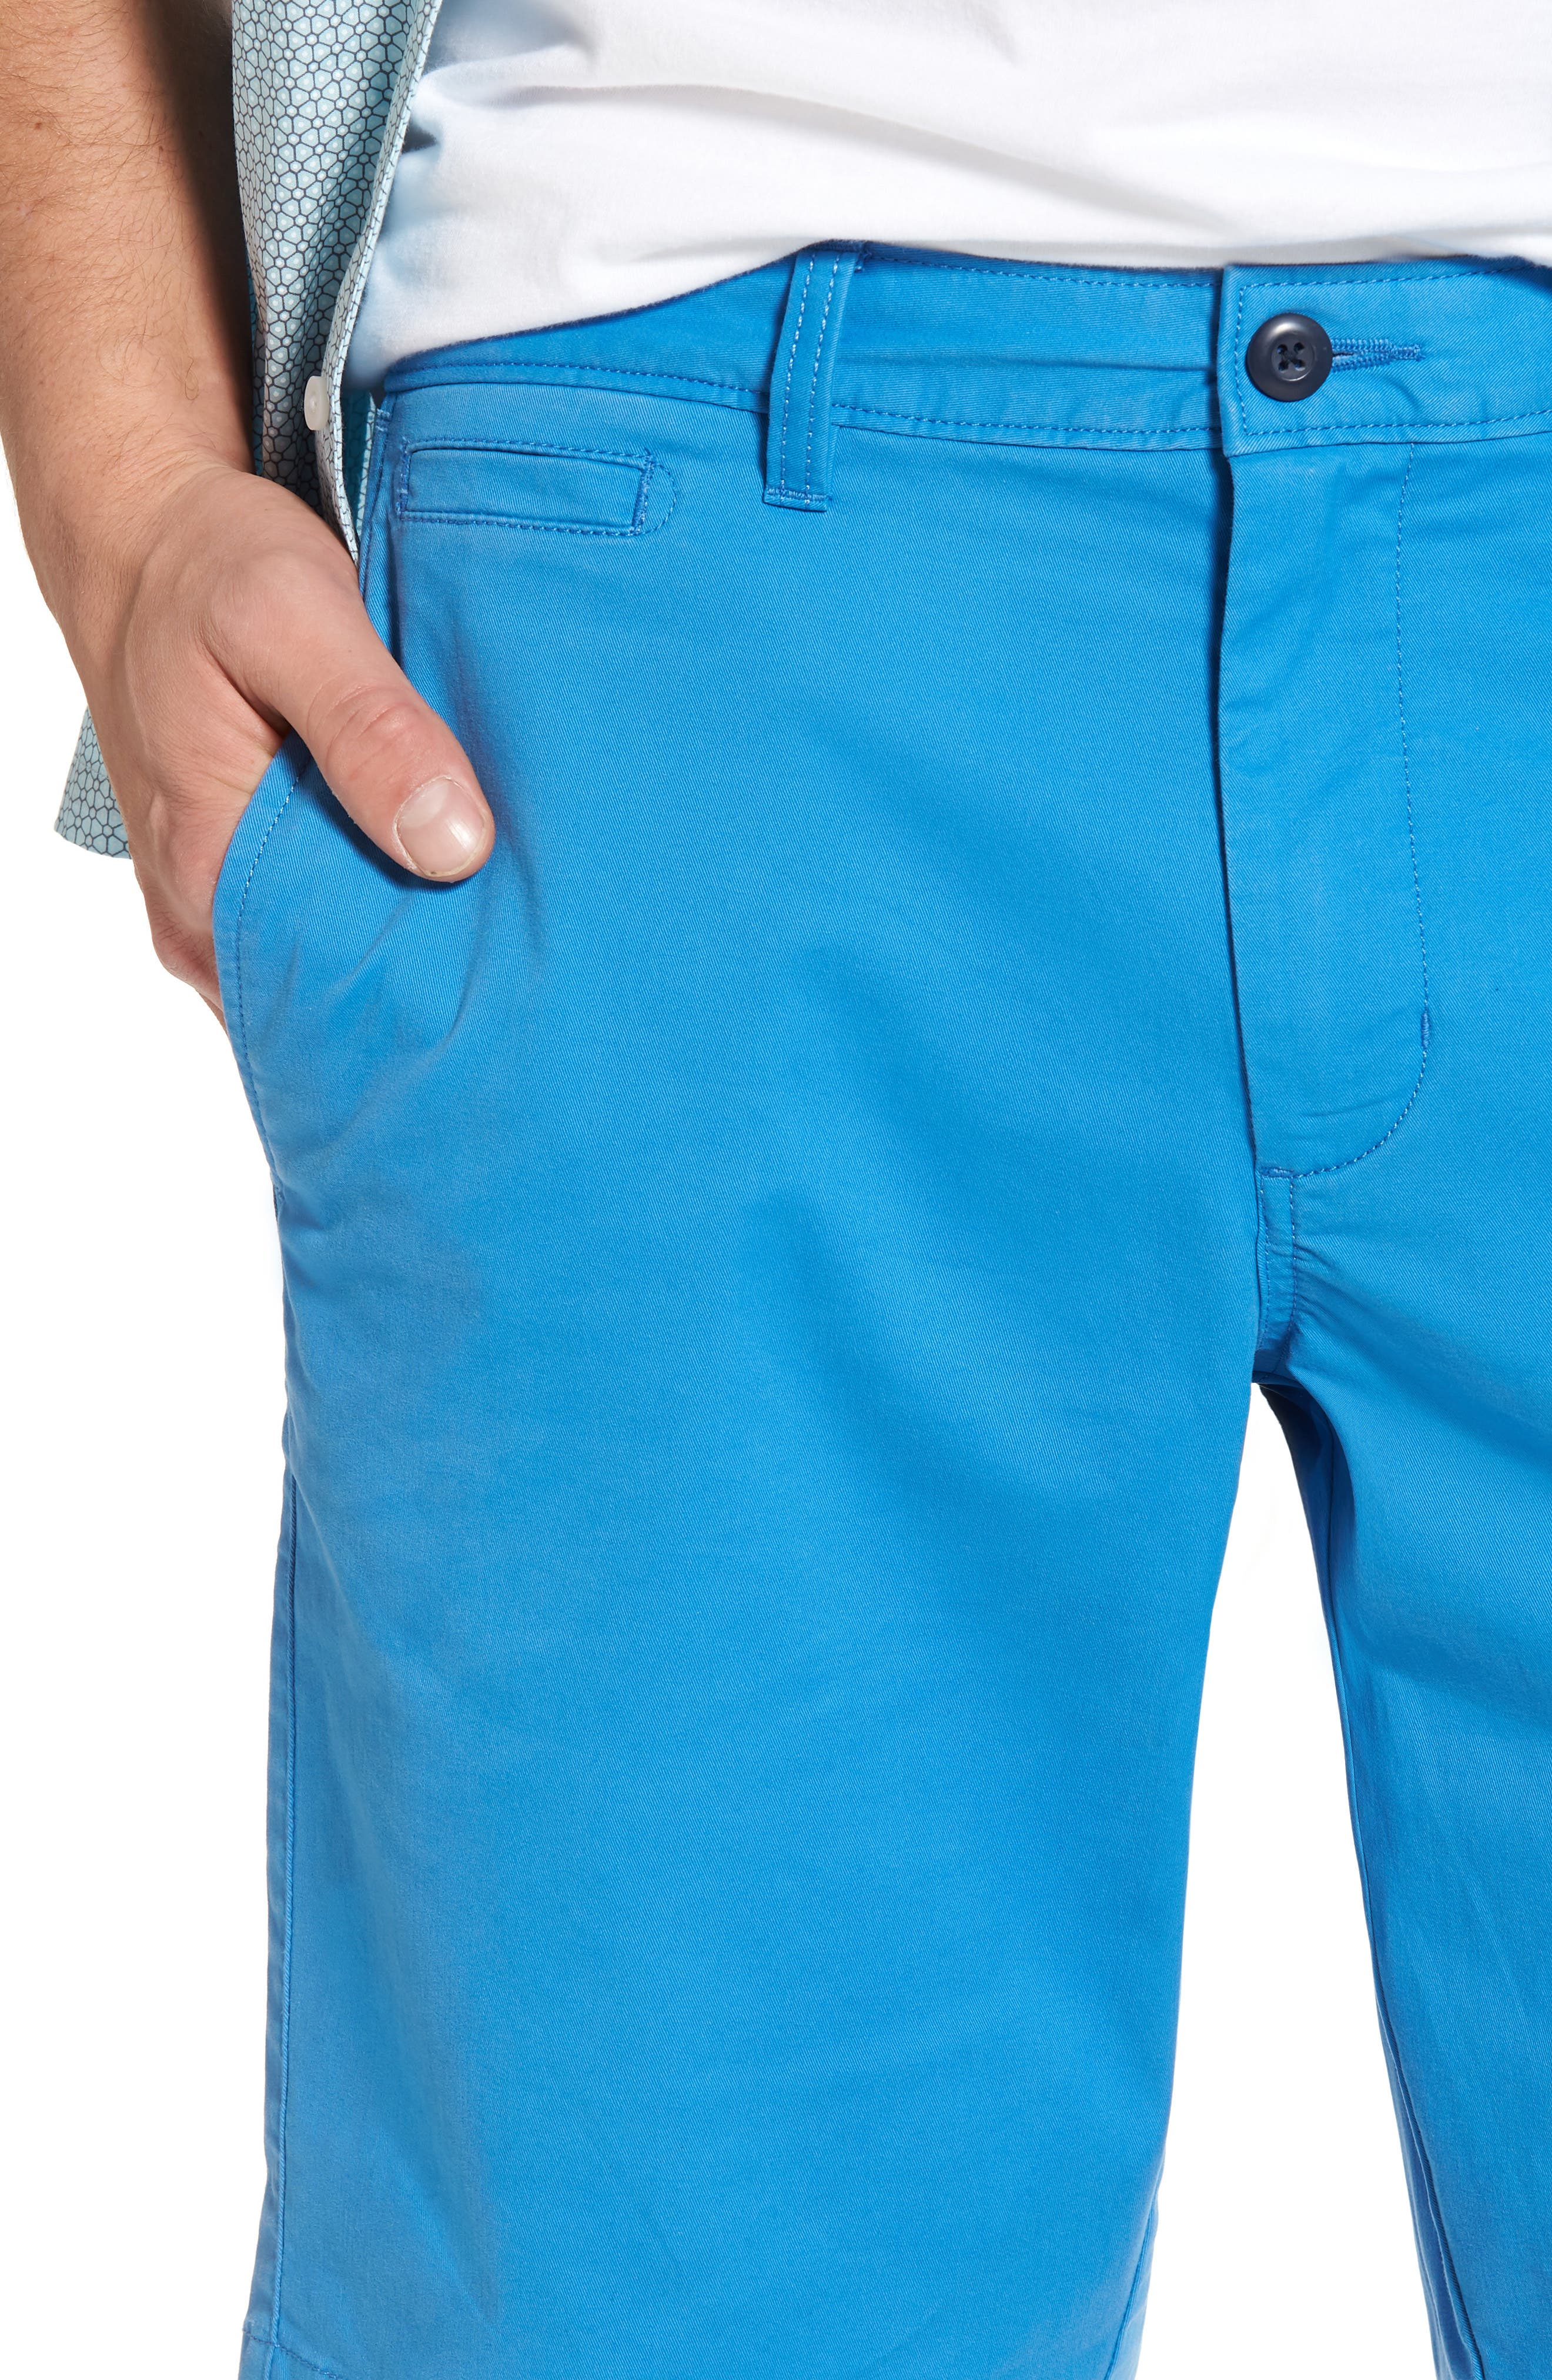 Ballard Slim Fit Stretch Chino 11-Inch Shorts,                             Alternate thumbnail 60, color,